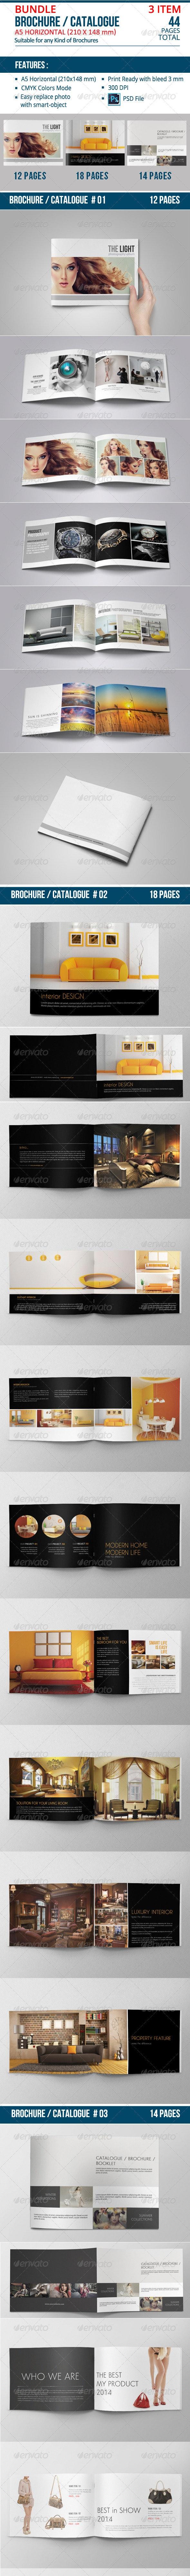 Catalogue / Brochure Bundle Vol. 04 - Catalogs Brochures